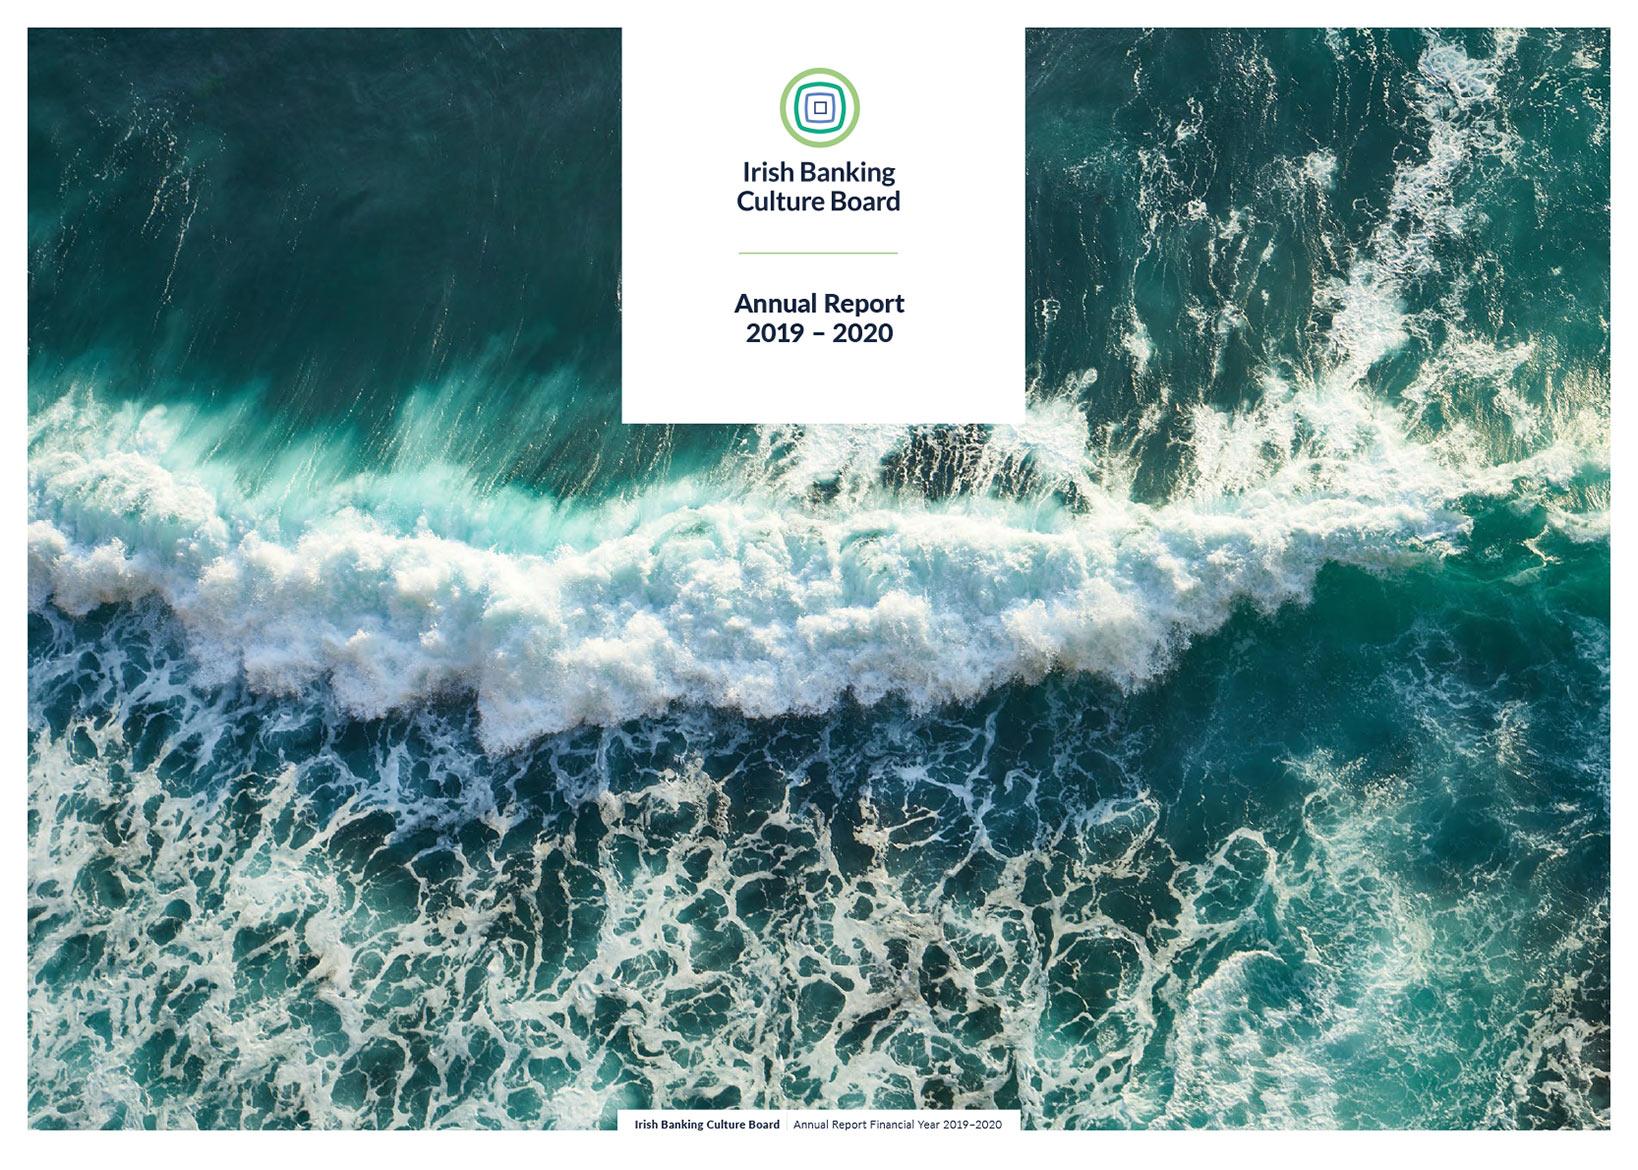 Irish Banking Culture Board (IBCB) Launches First Annual Report